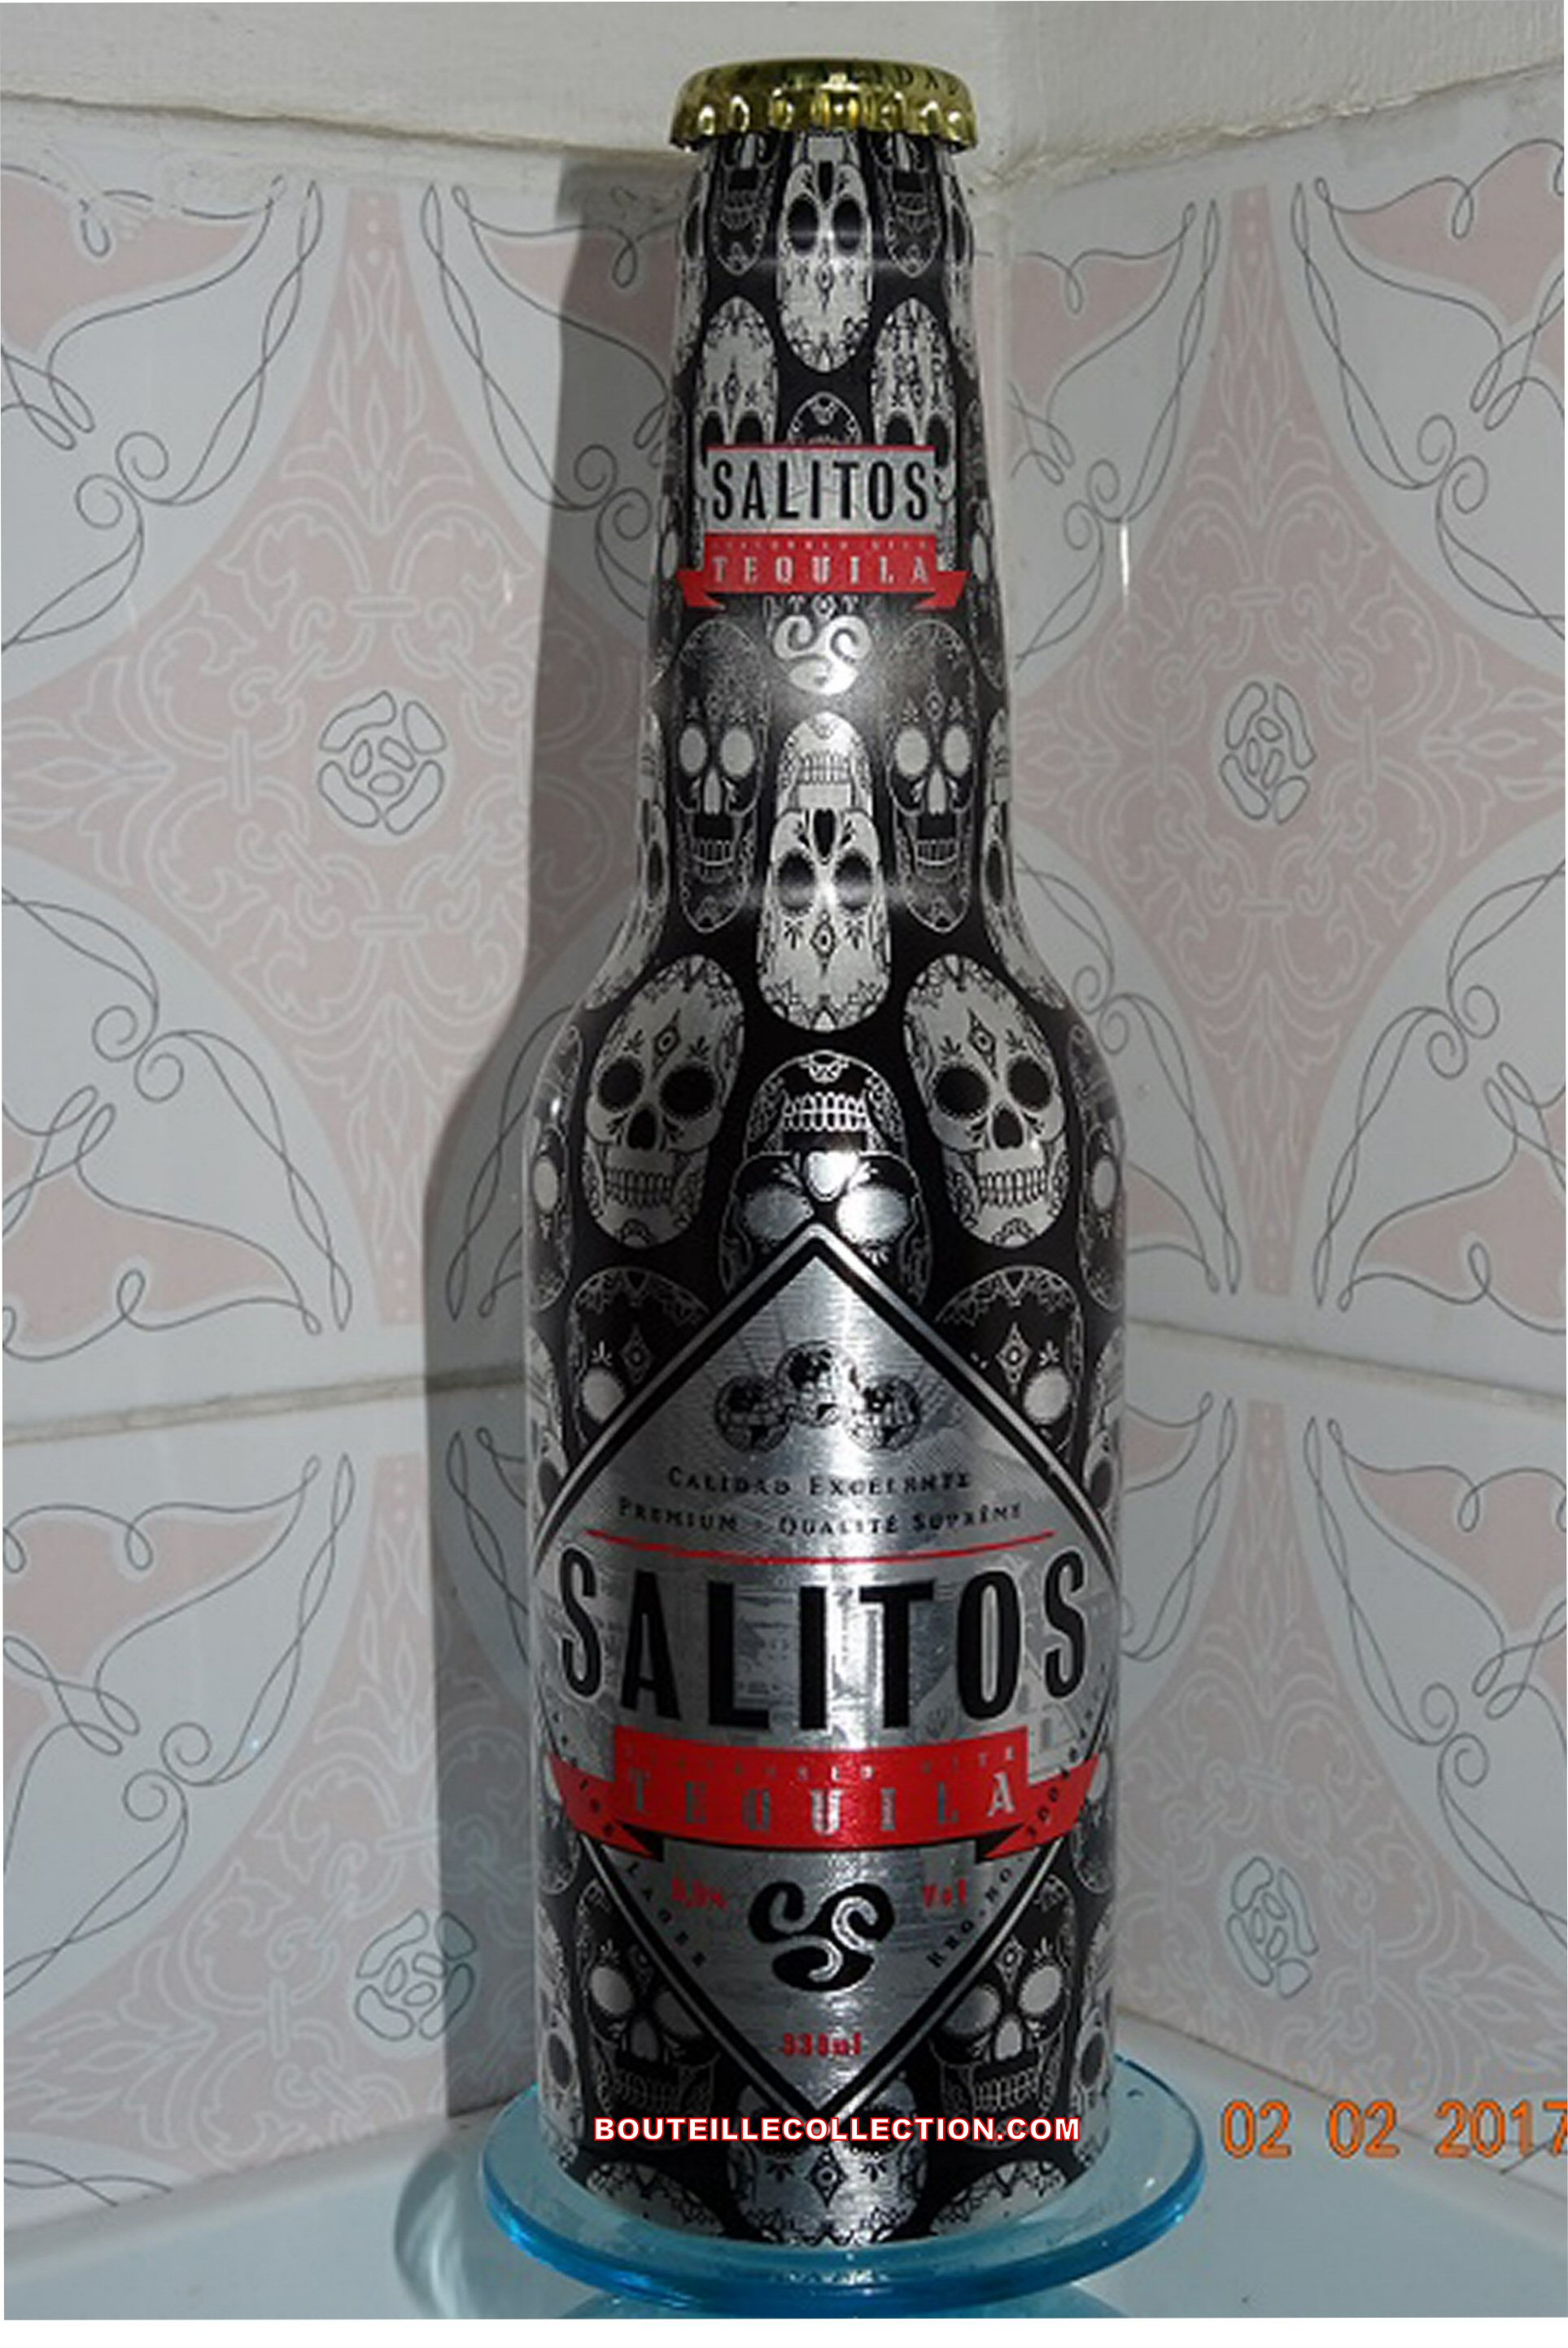 SALITOS TEQUILA 33CL B .JPG